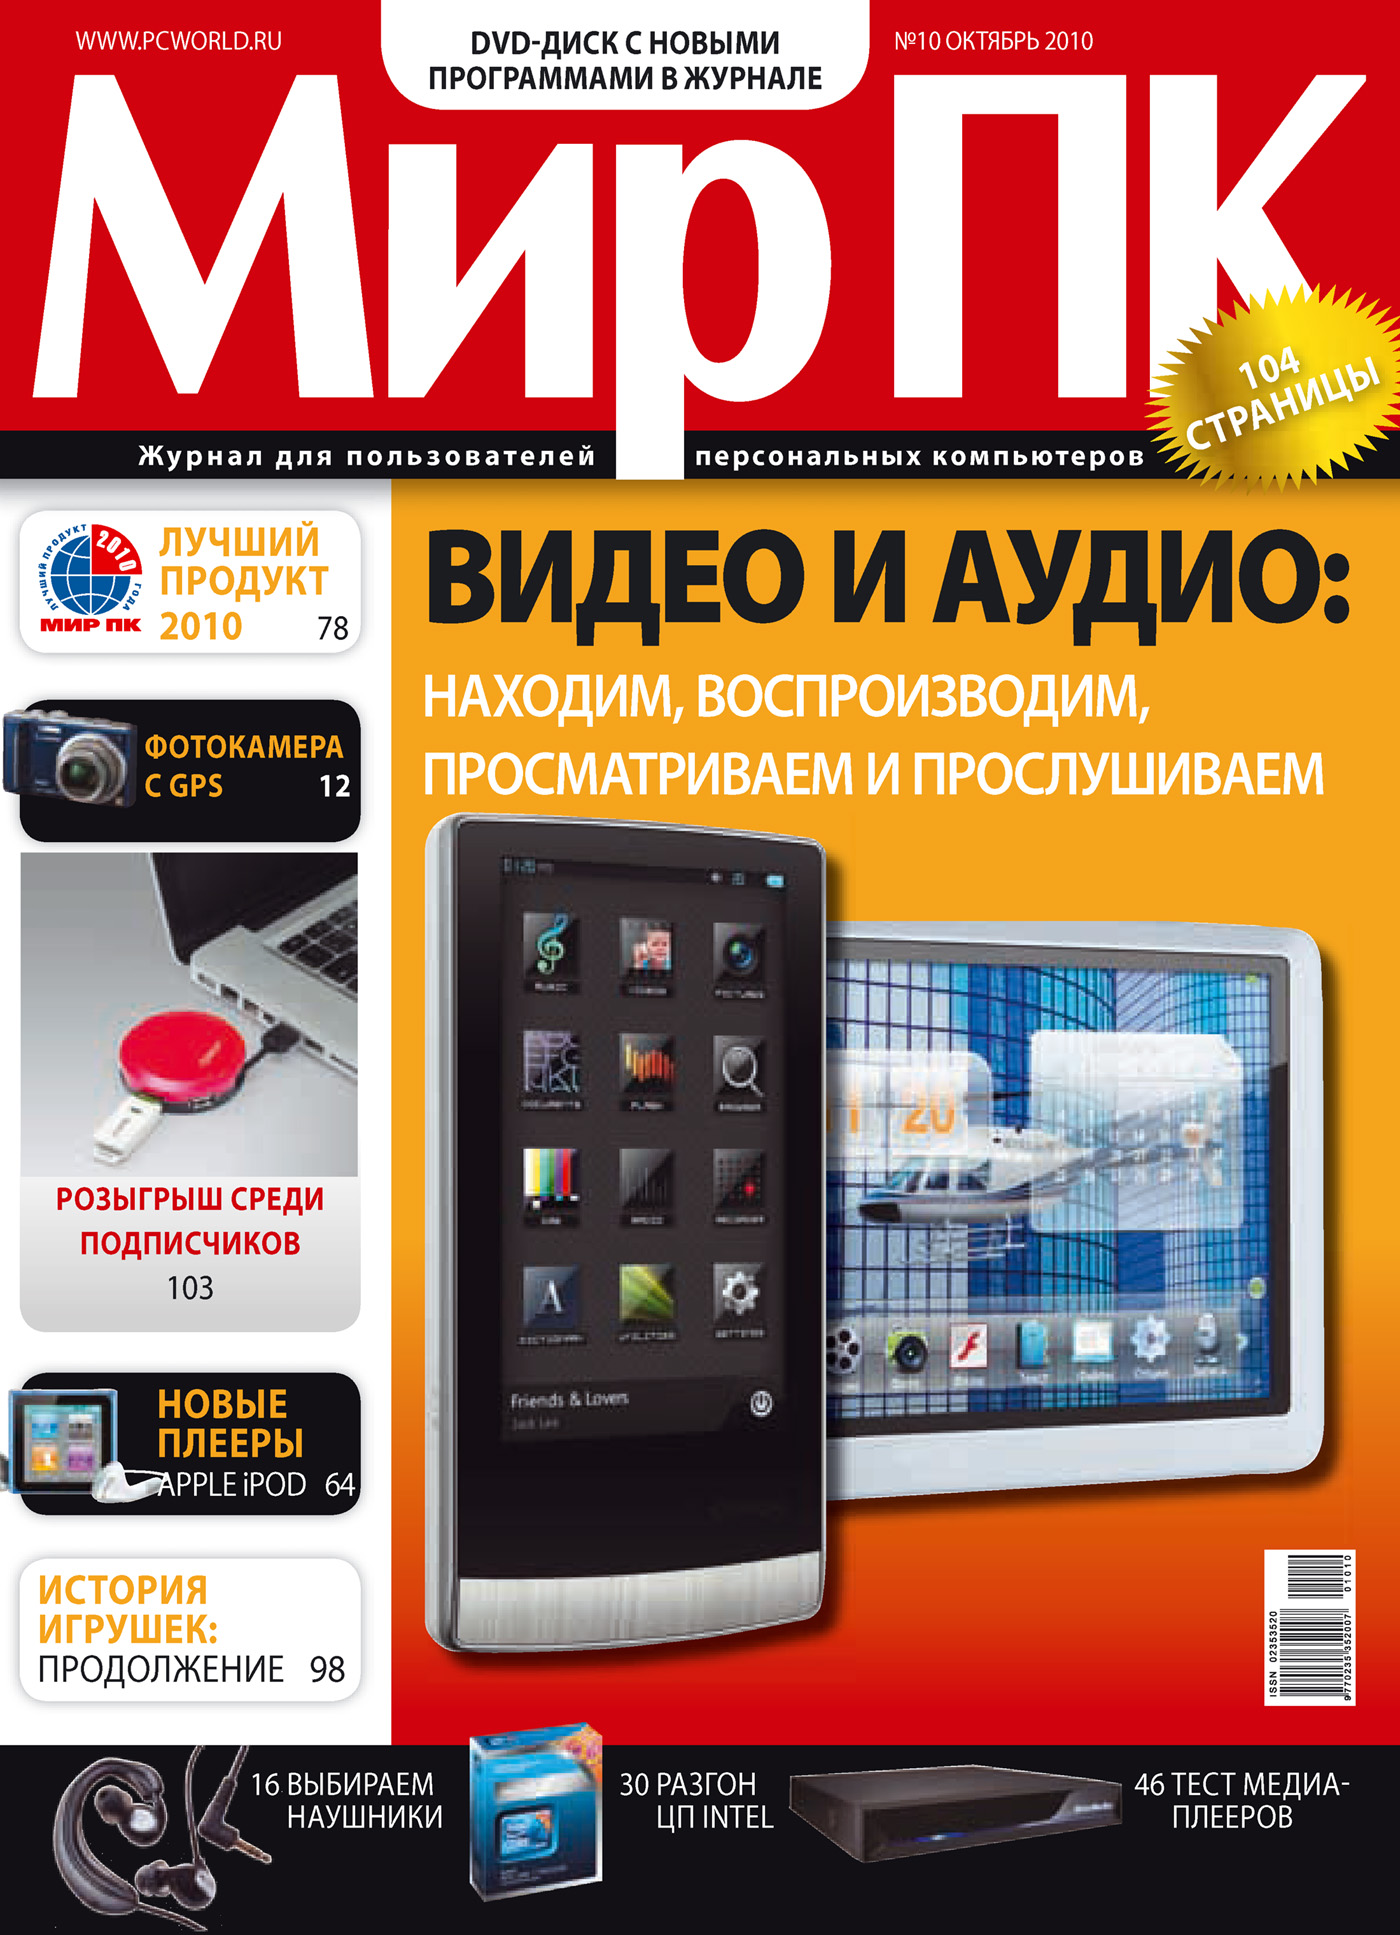 Журнал «Мир ПК» №10/2010